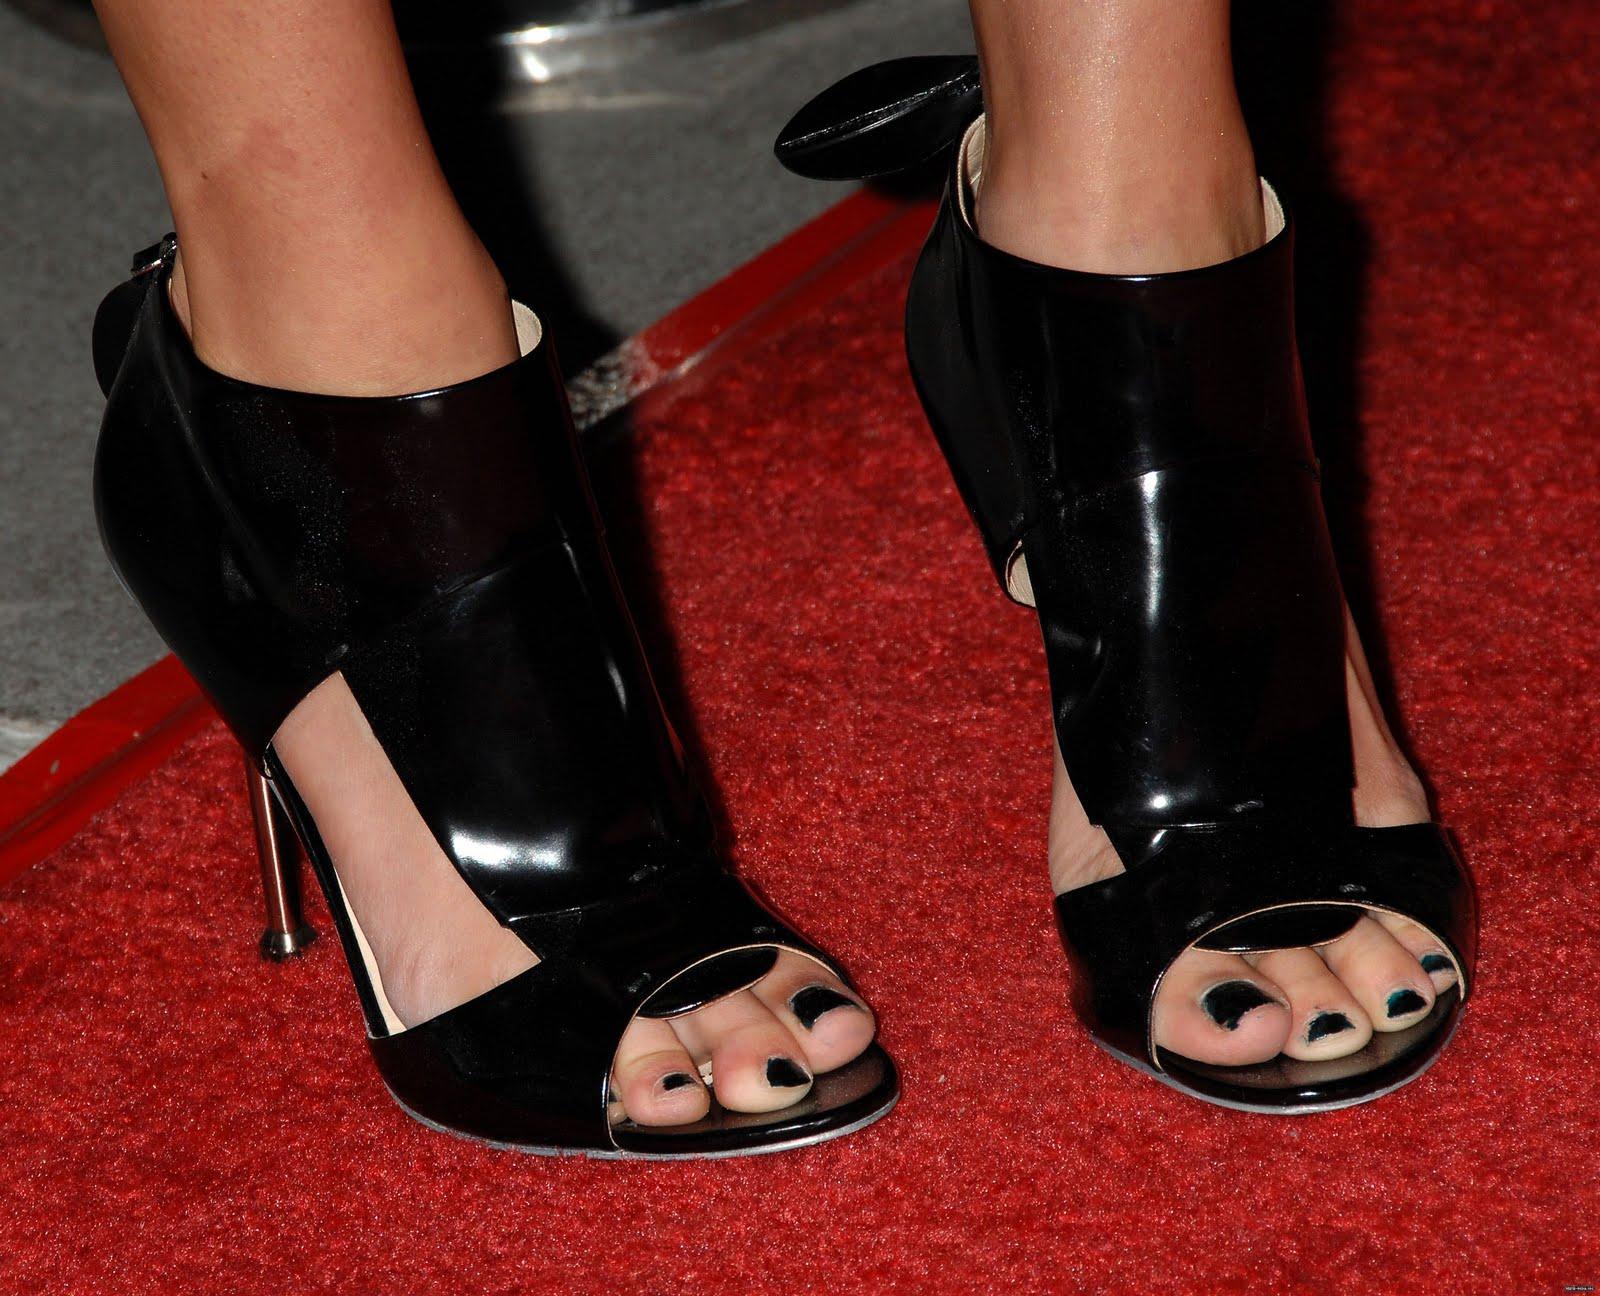 http://4.bp.blogspot.com/_UaLWp72nij4/S98pdZhtUeI/AAAAAAAAJaQ/7DveO1qoOI4/s1600/jessica-stroup-feet.jpg